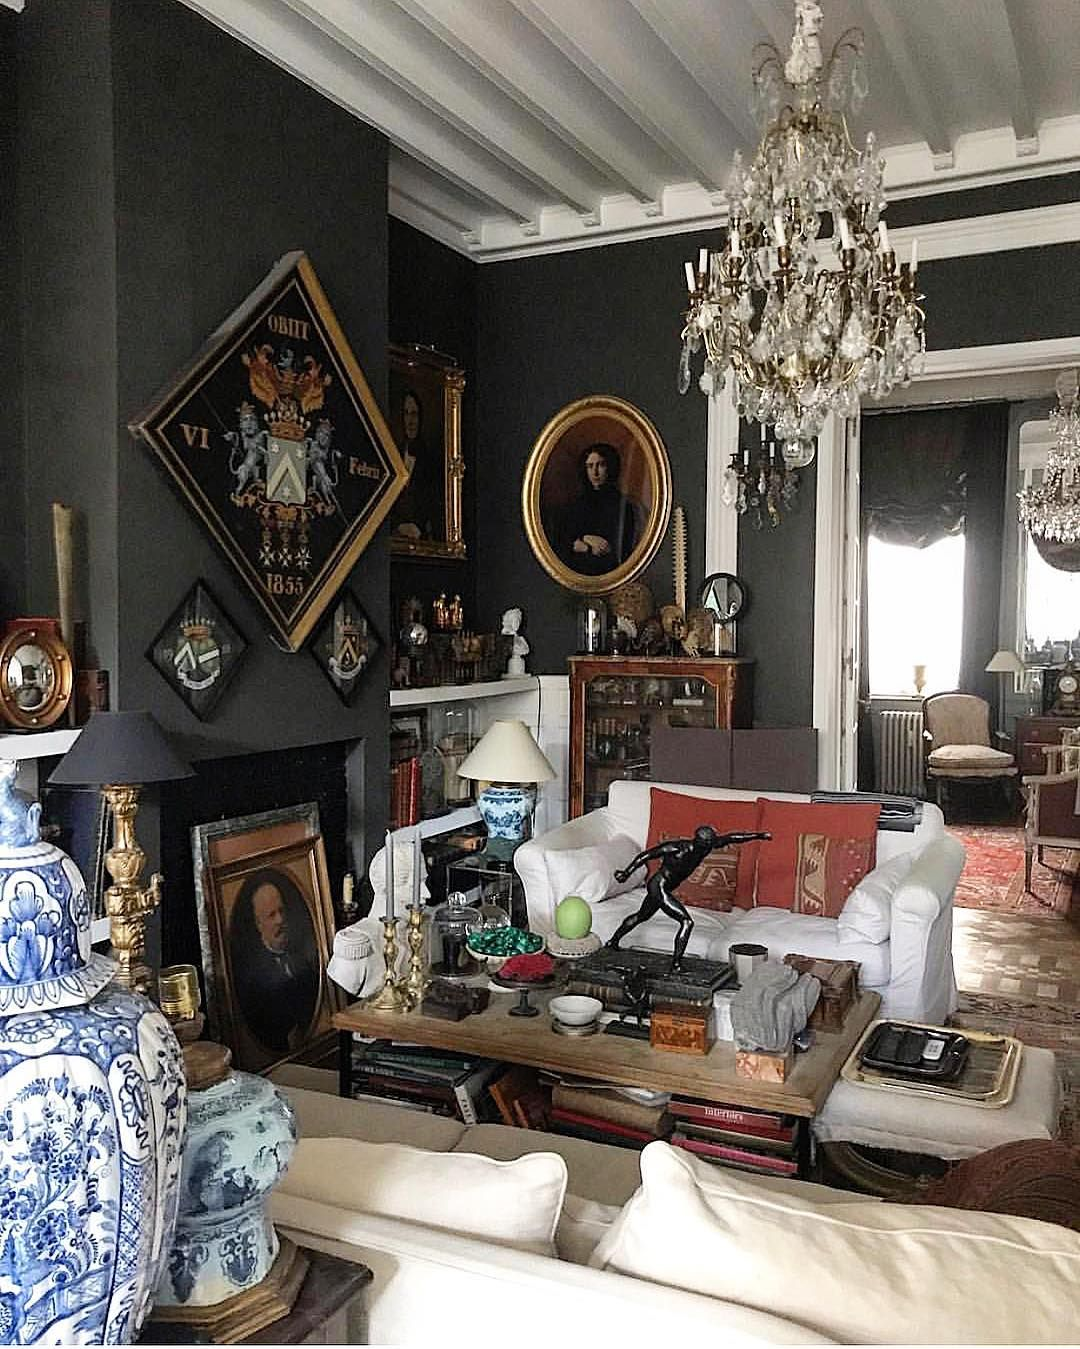 The Real Maggie Shepherd On Instagram Art Istic Licence Superior Interior By Neo Thissen Neothissen Interior With Images Interior Spaces Interior Interior Design